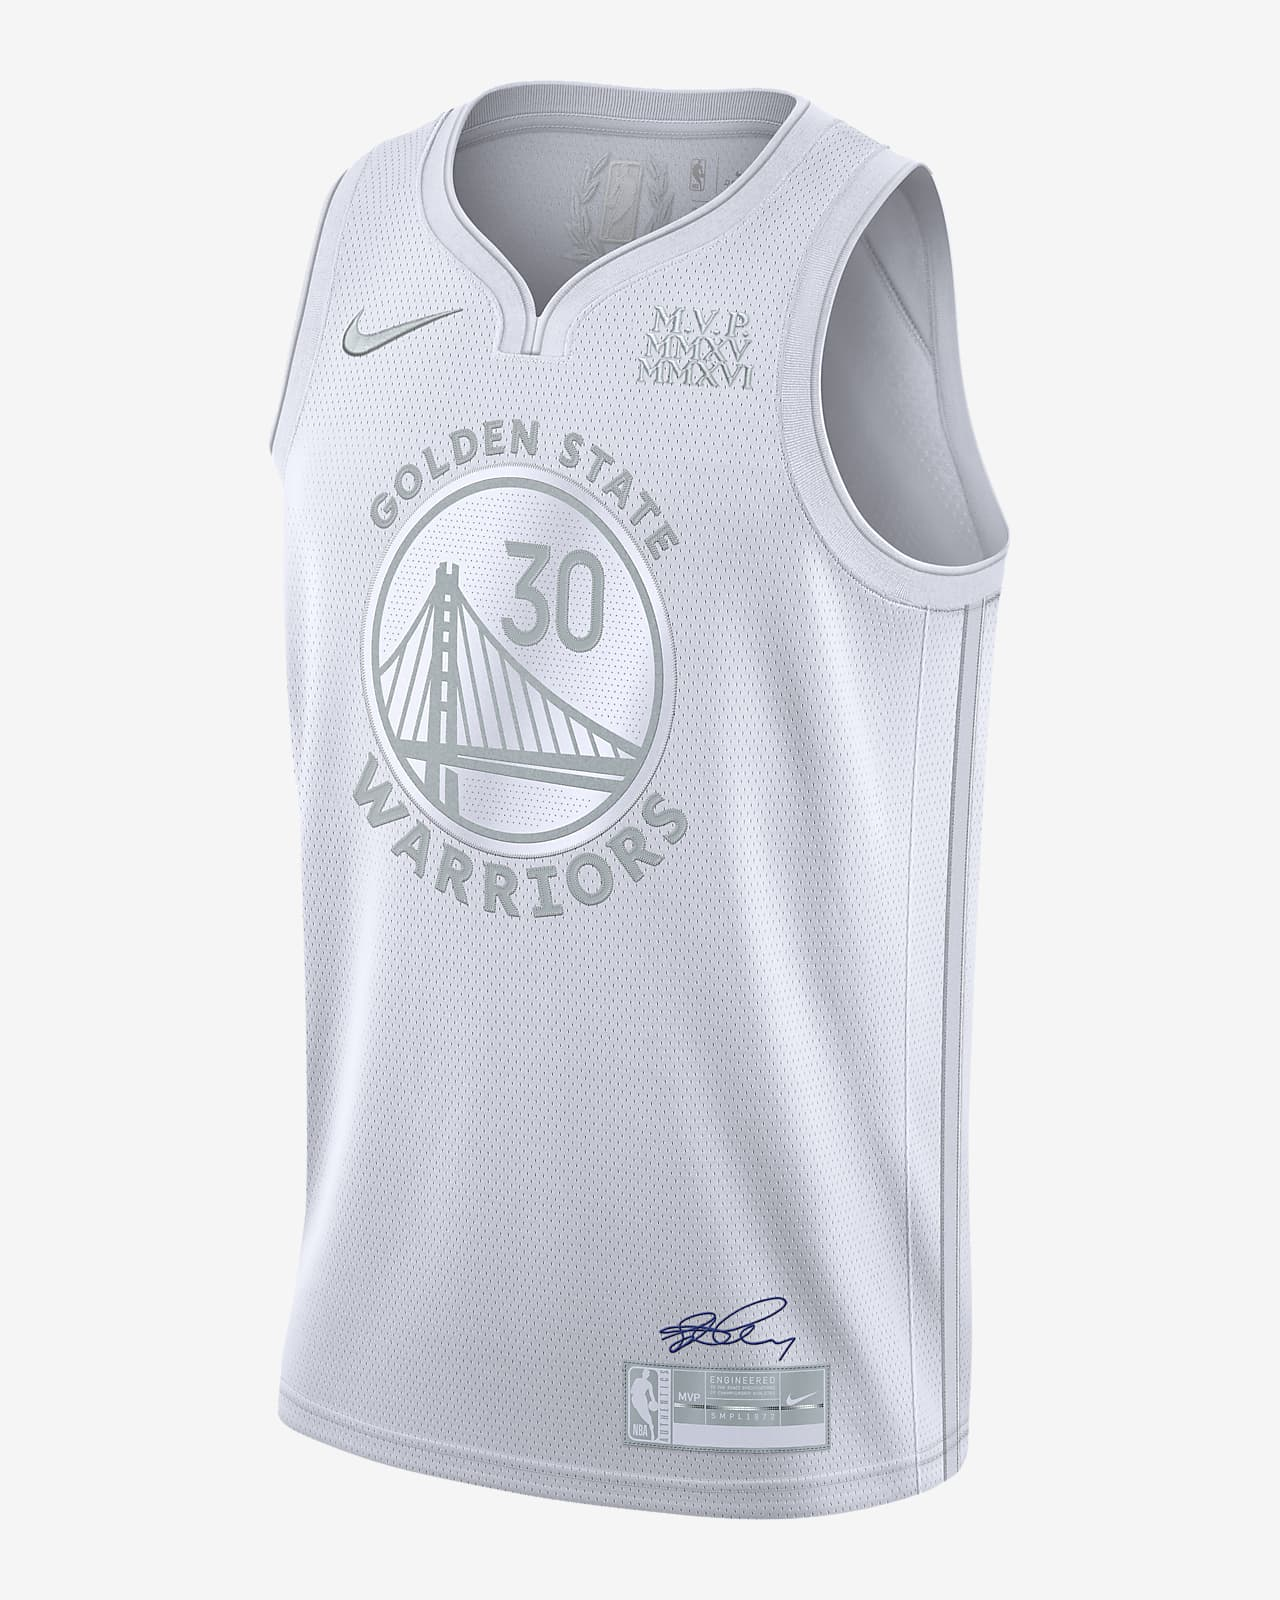 Stephen Curry Warriors MVP Men's Nike NBA Jersey